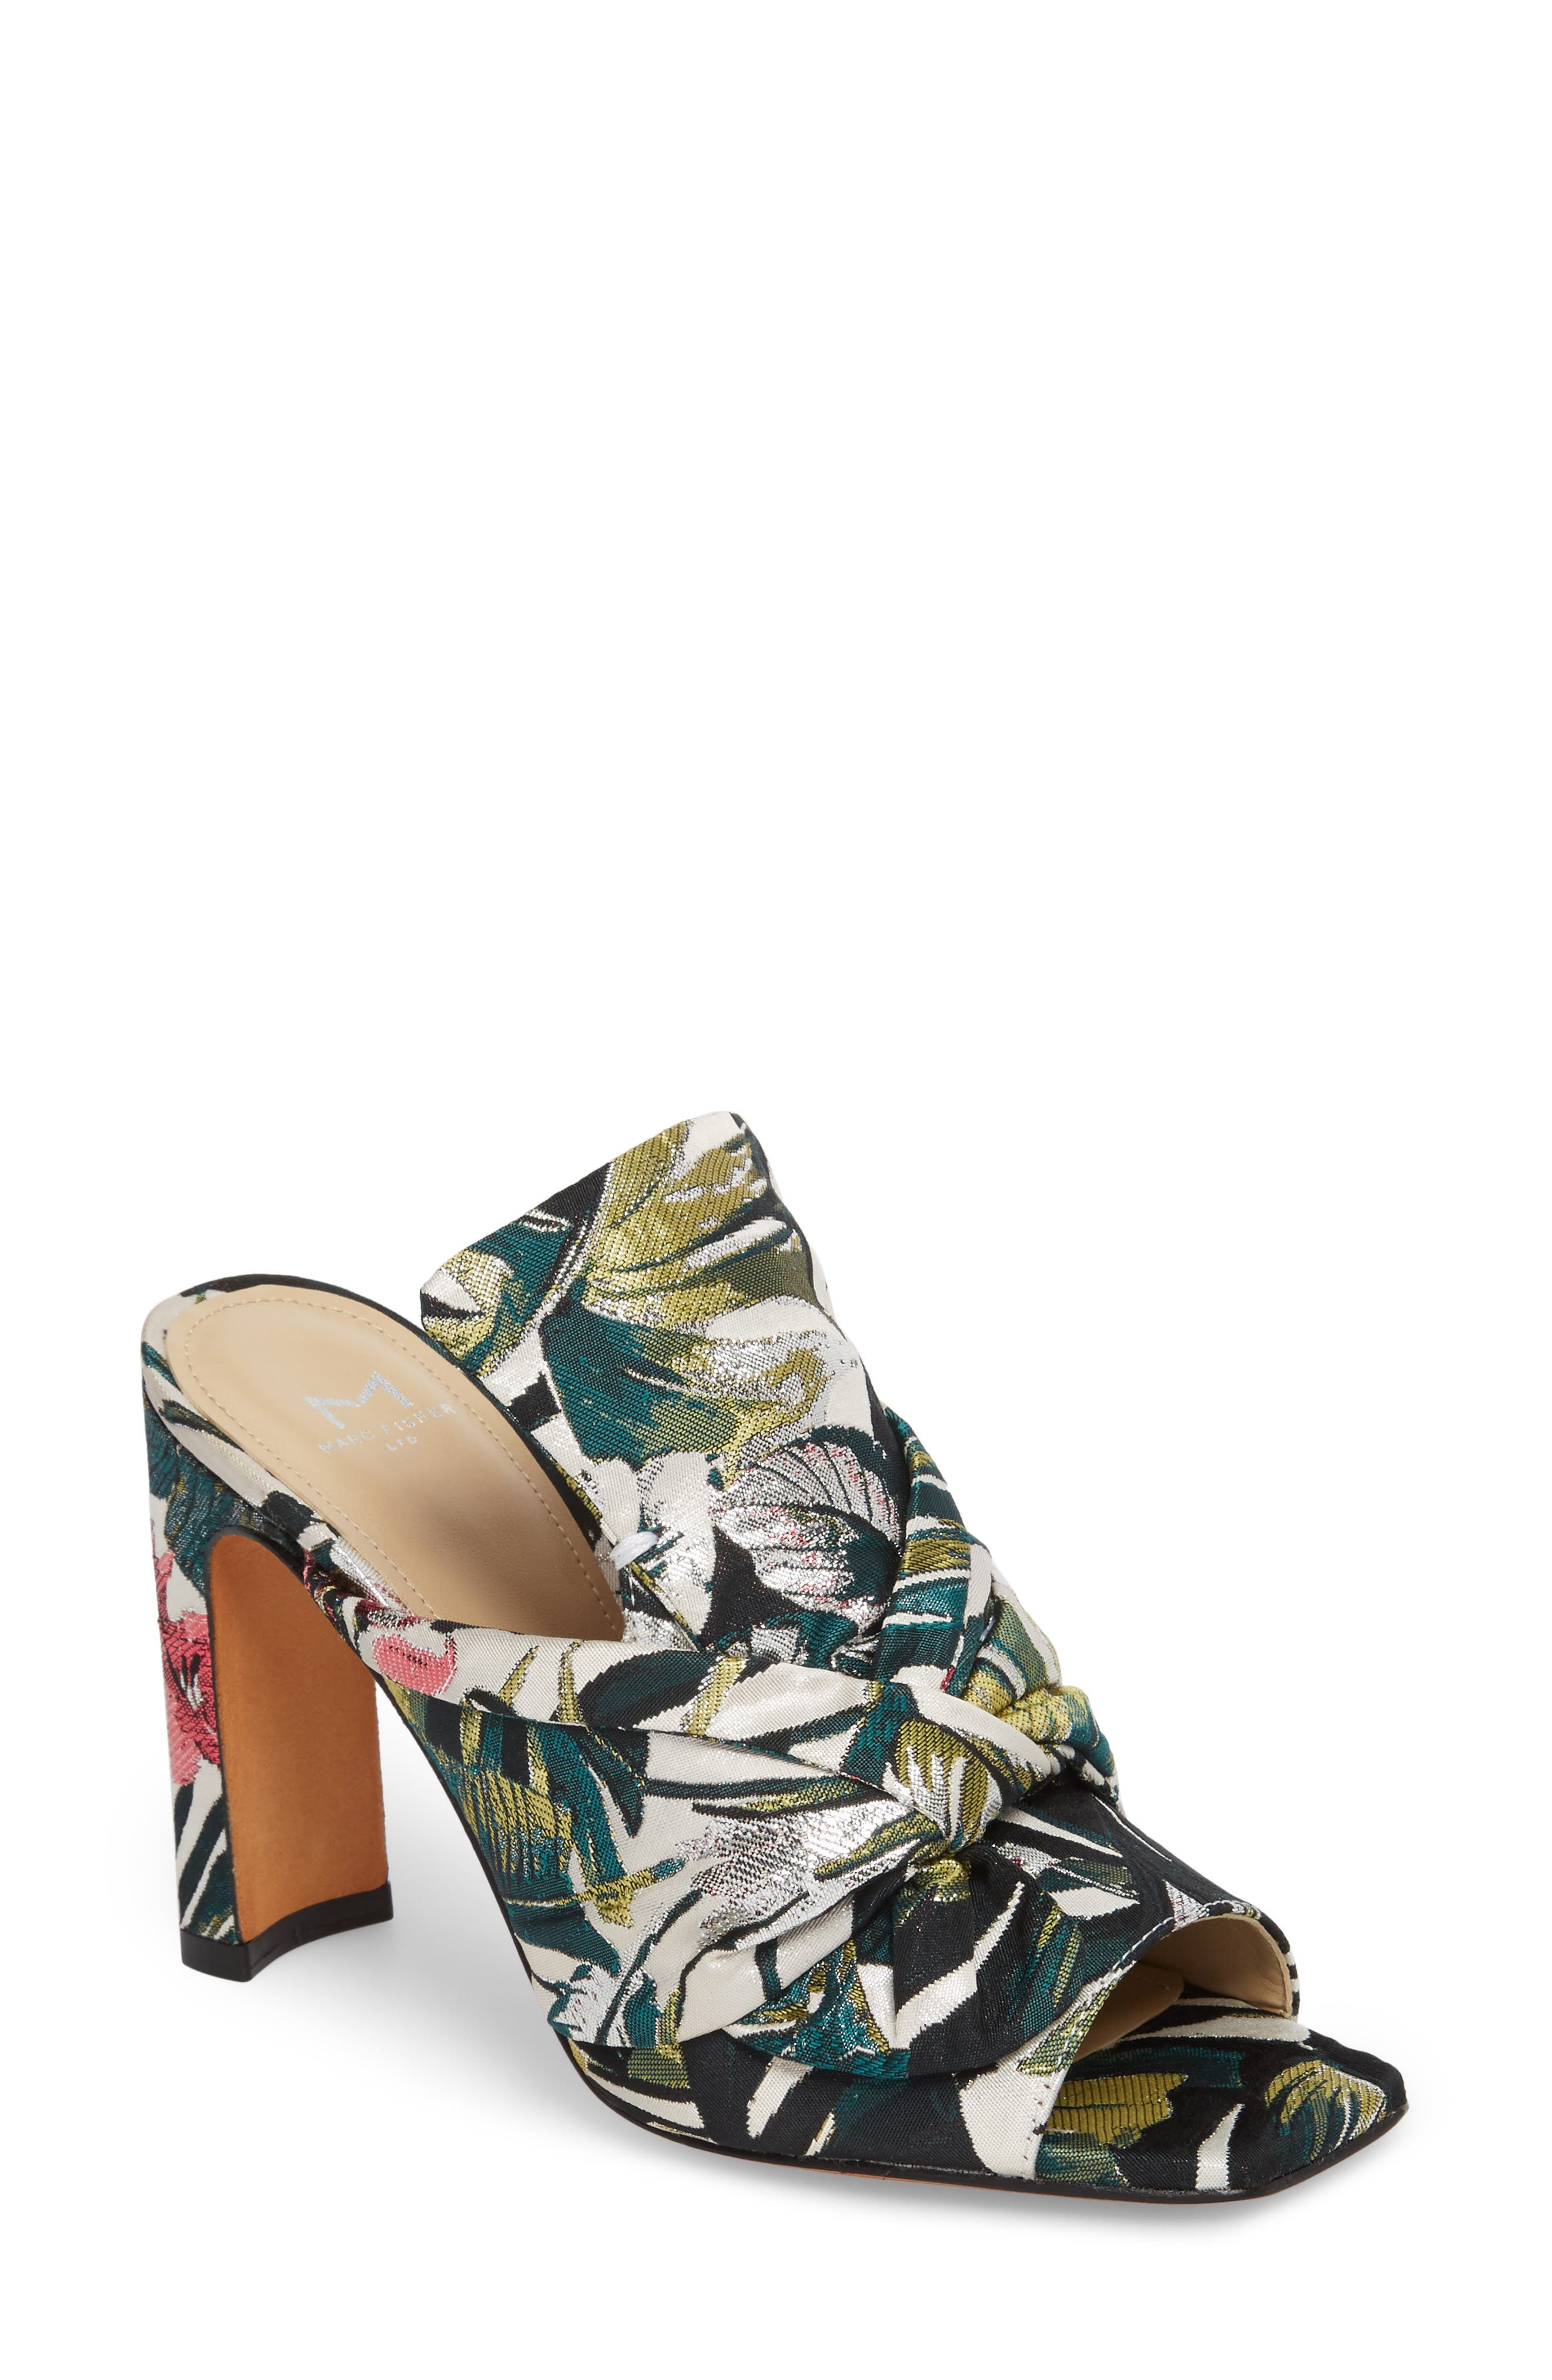 Hogan Slide Sandal,                         Main,                         color, White Leather